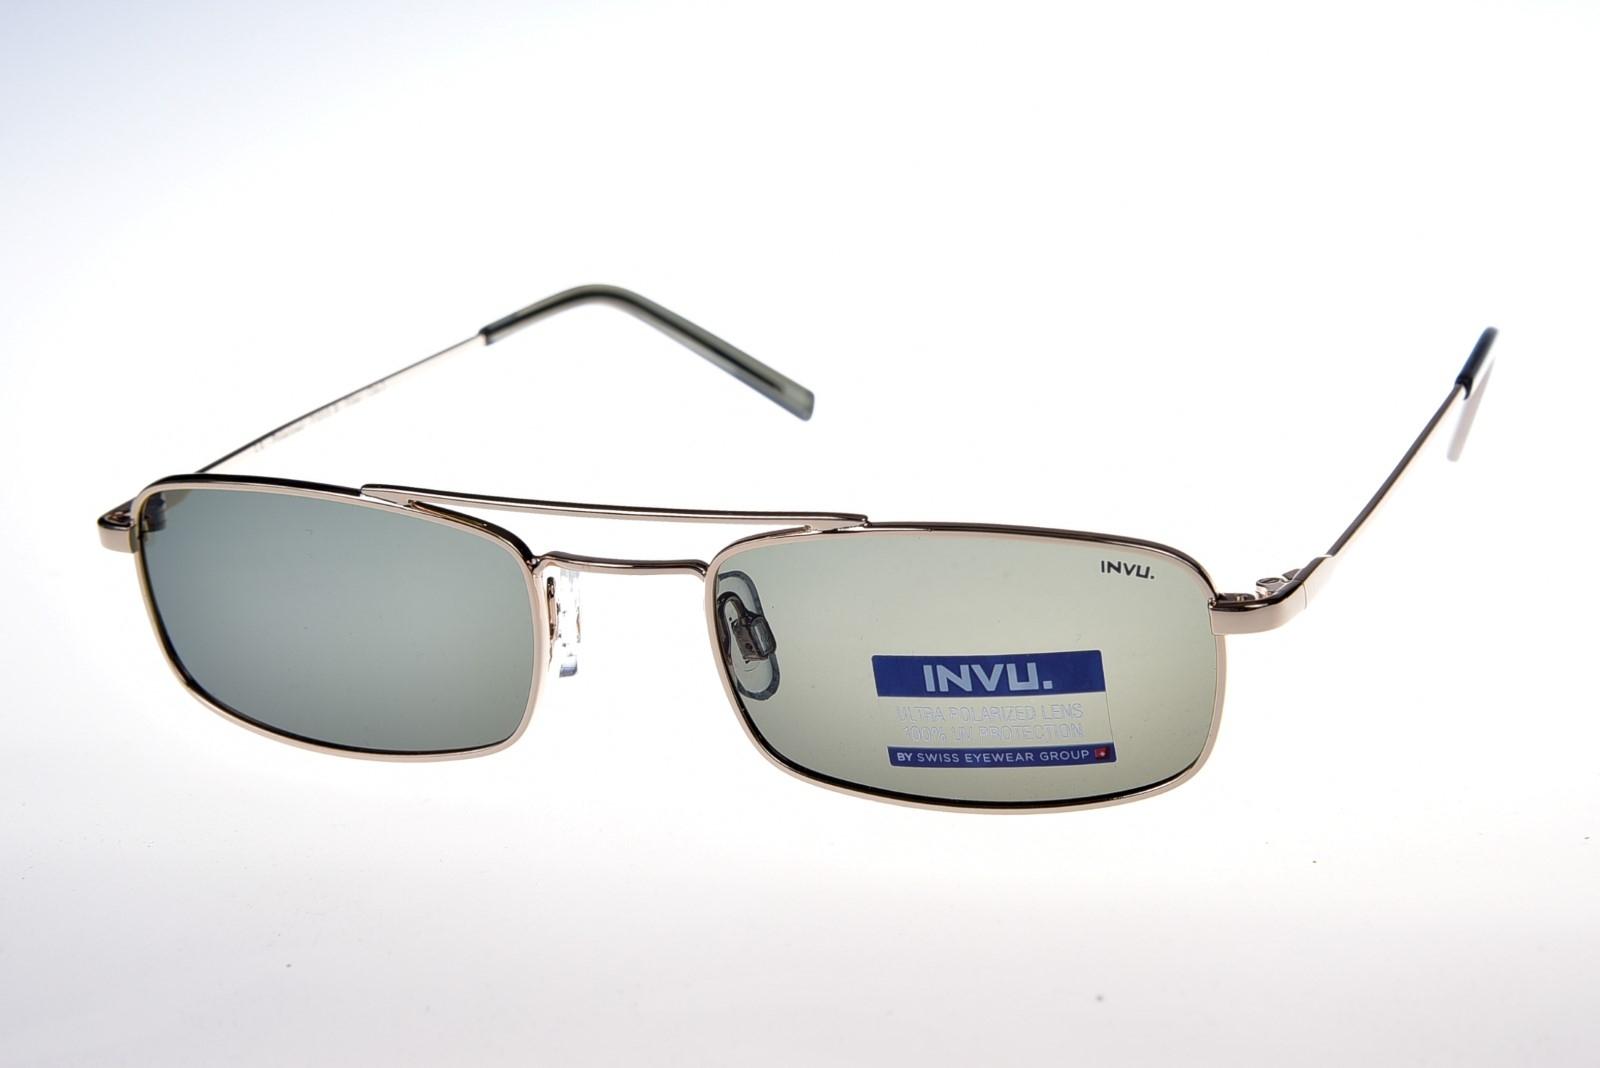 INVU. Trend T1013B - Unisex slnečné okuliare